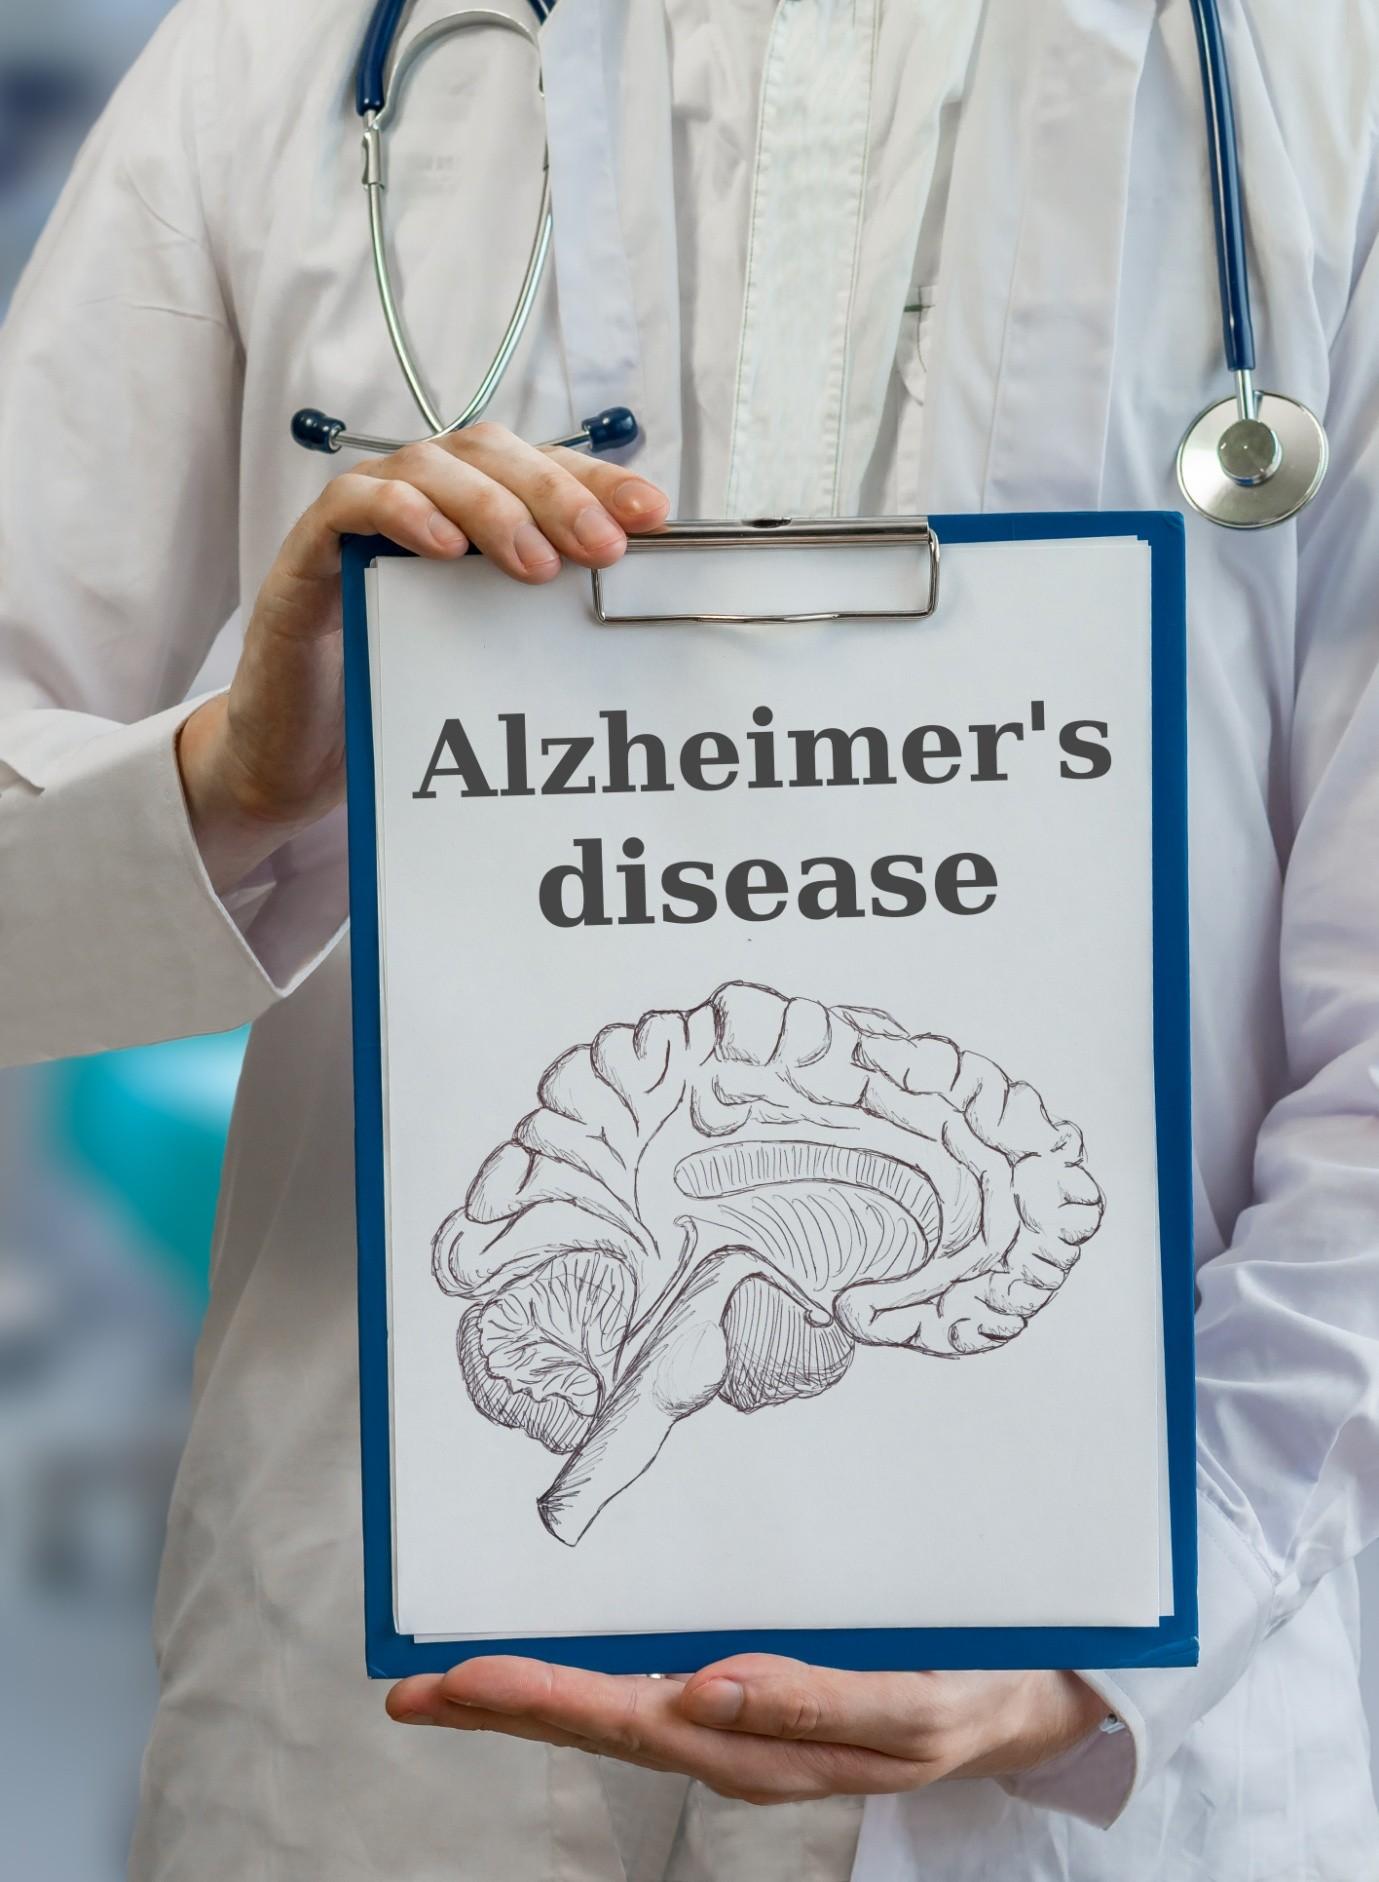 Can Diet Prevent Alzheimer's disease?